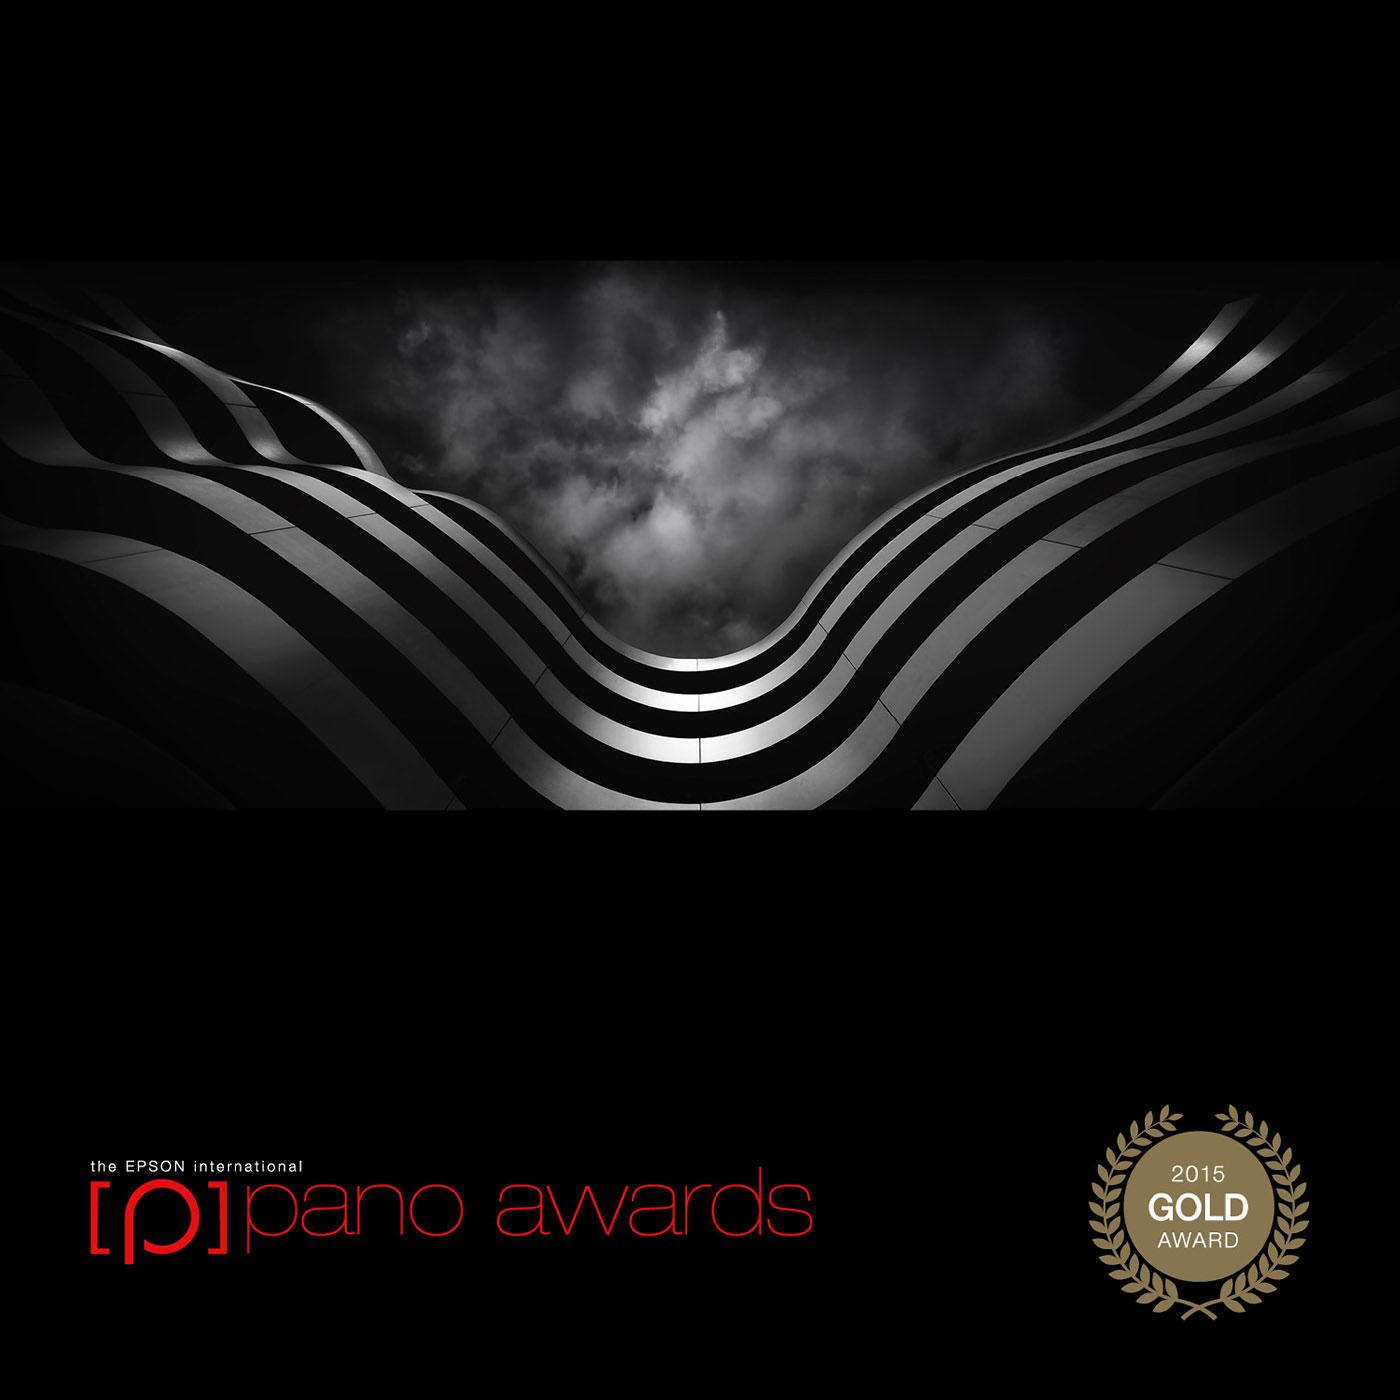 """wings"" 2nd place, 2015 Epson International Pano Awards"